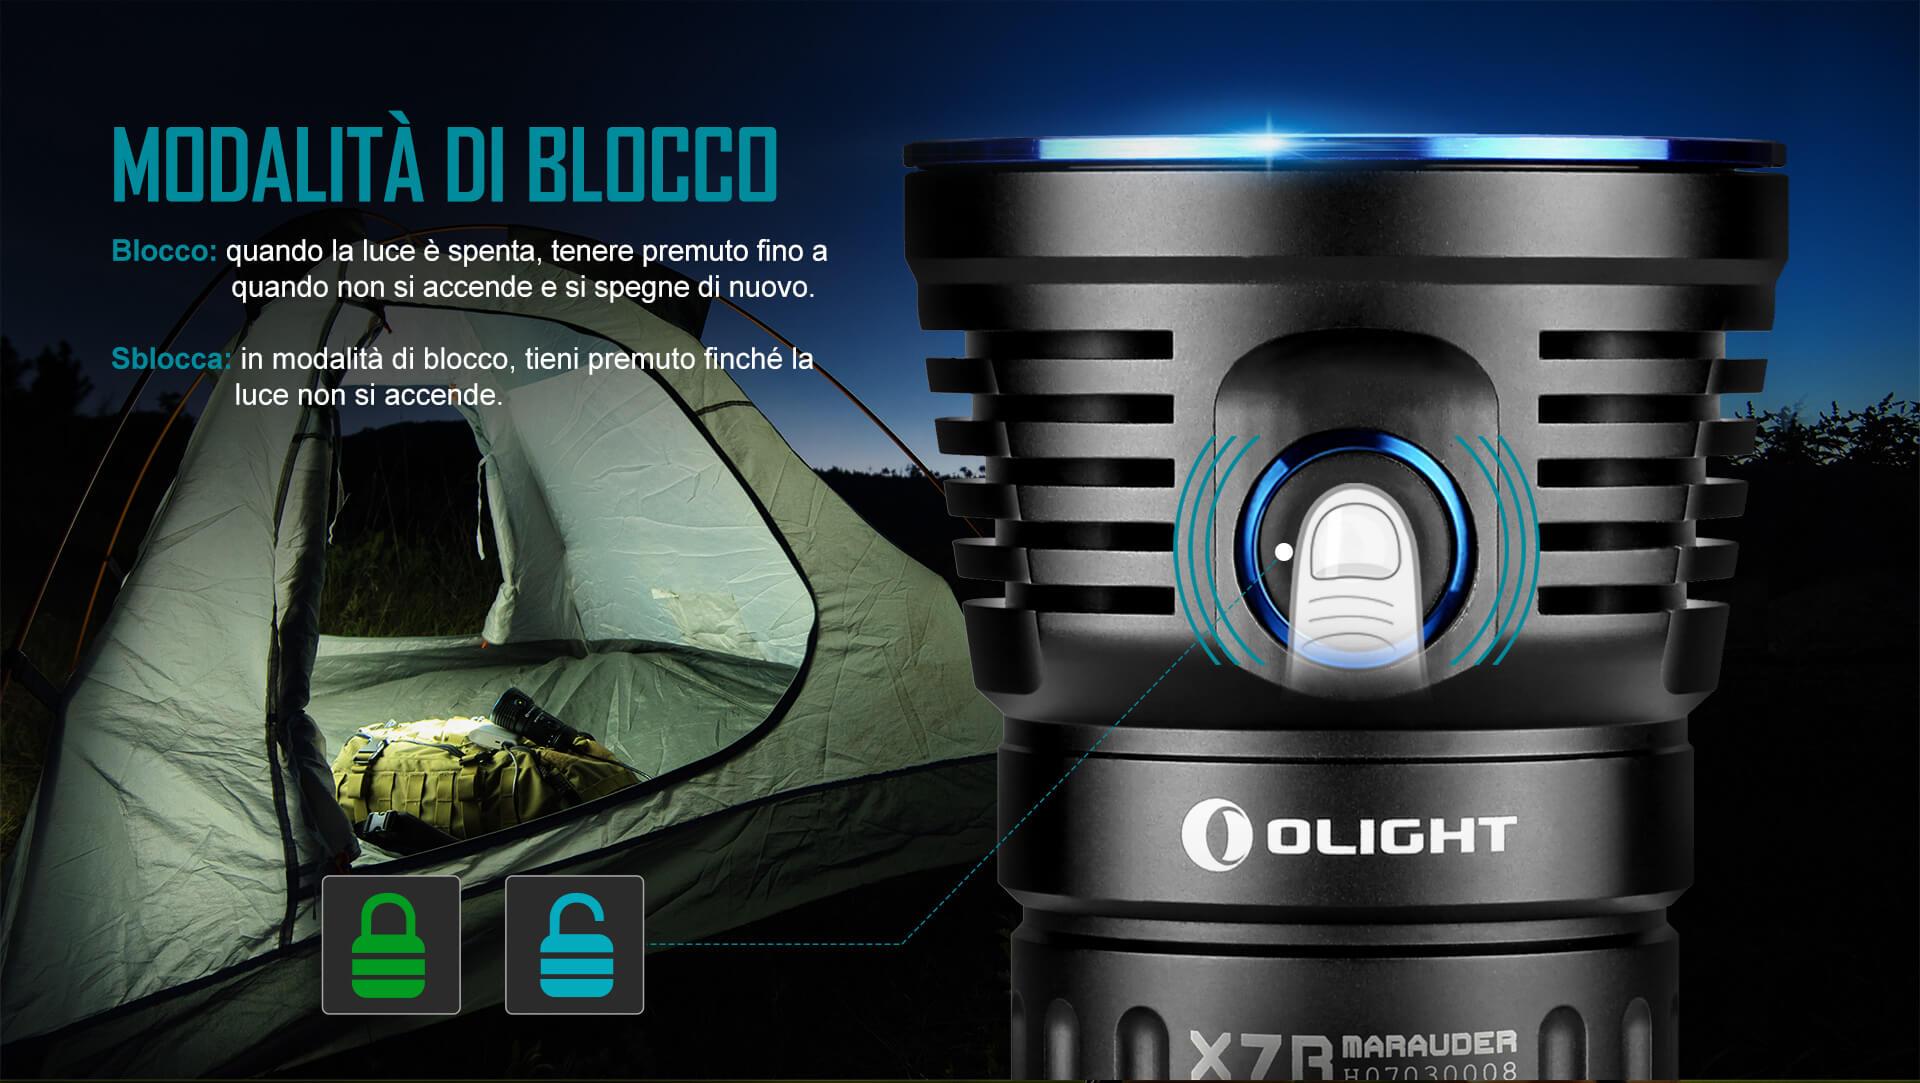 Olight X7R Marauder, Torce Potentissime